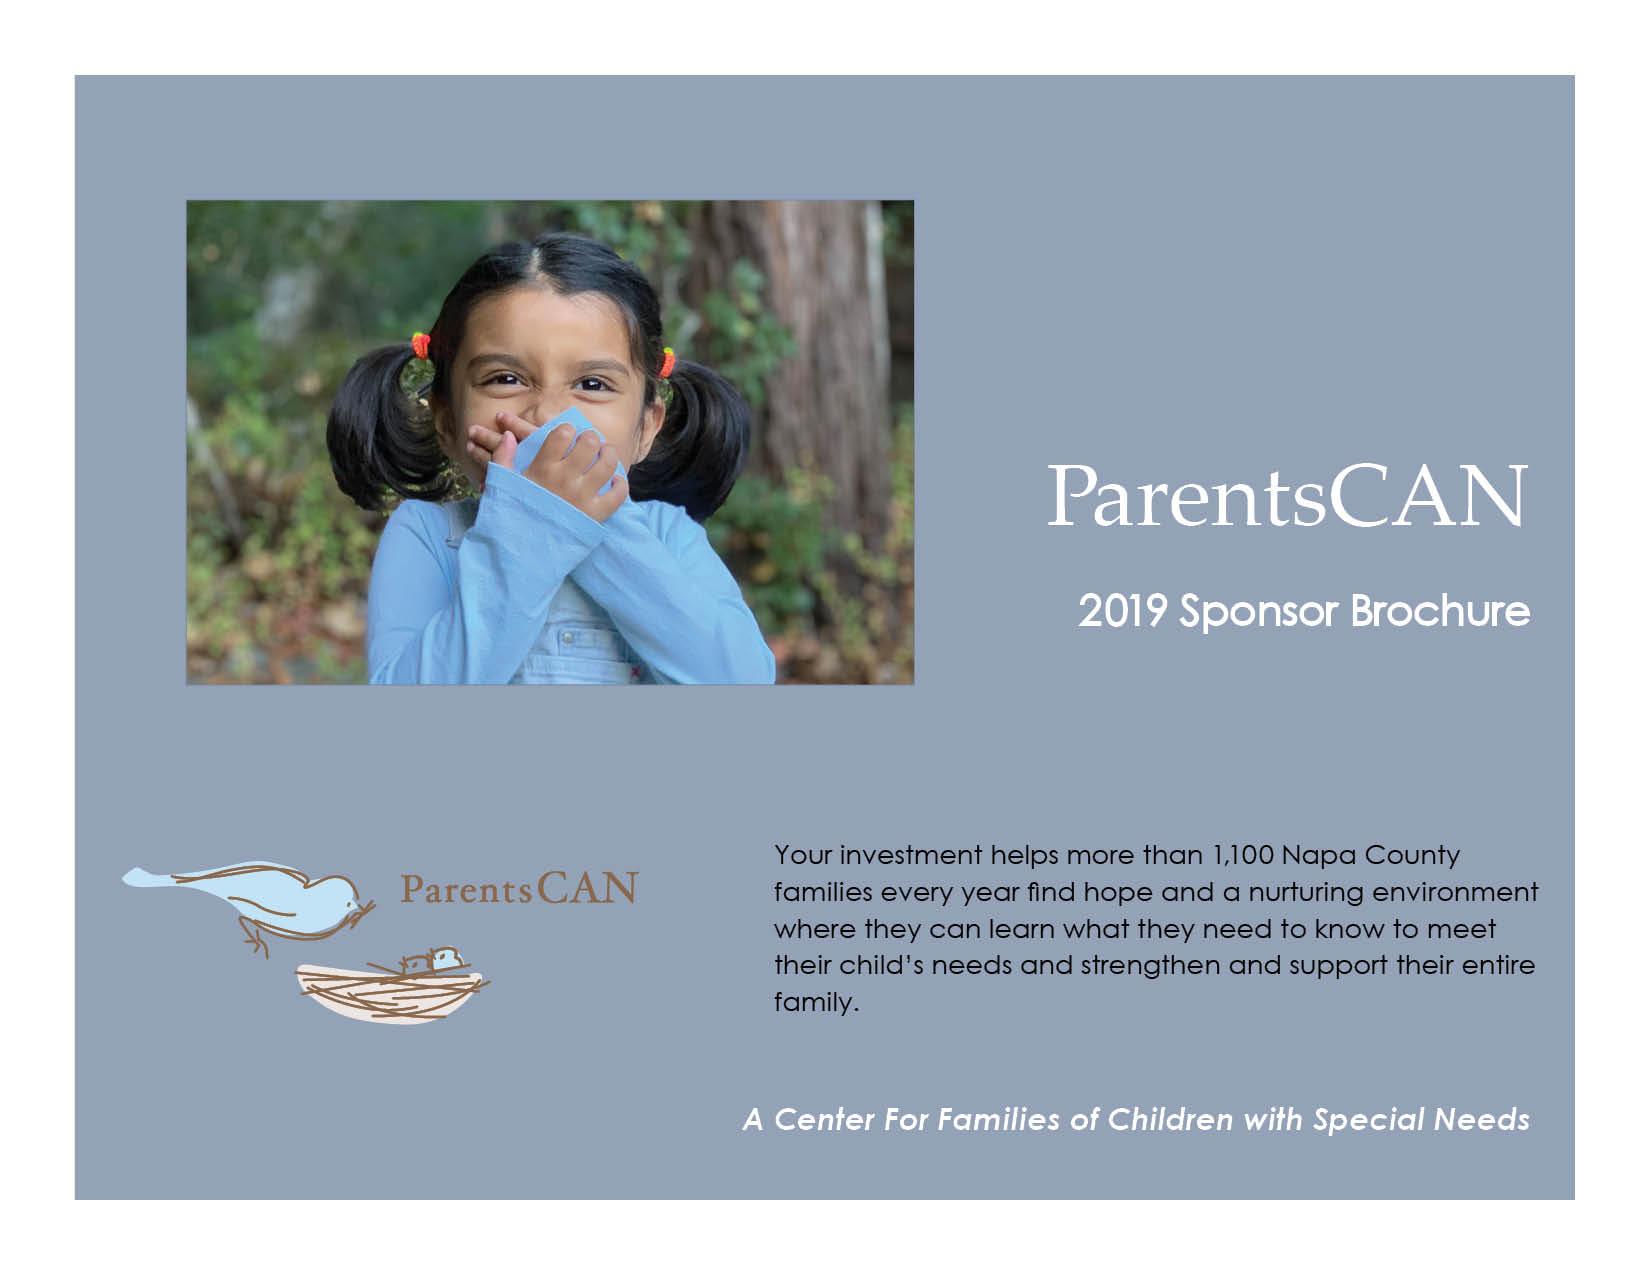 ParentsCAN : Support ParentsCAN! : Corporate Sponsorships